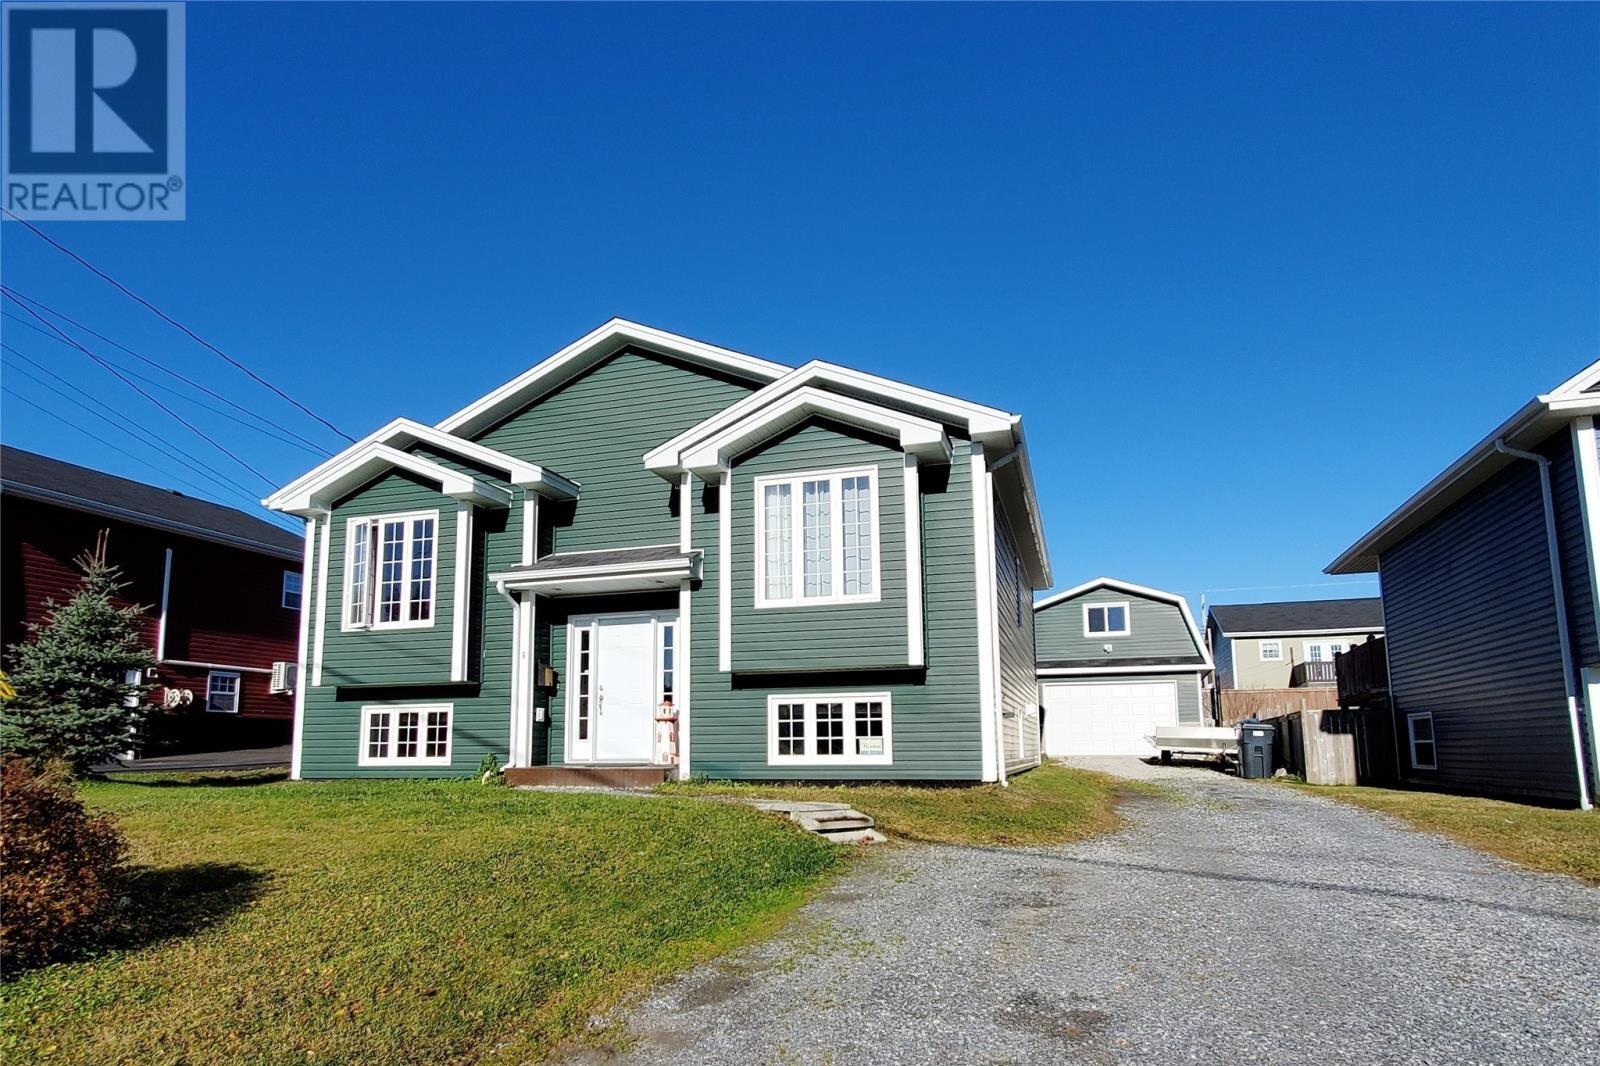 House for sale at 6 Hanlon Dr Massey Drive Newfoundland - MLS: 1223445